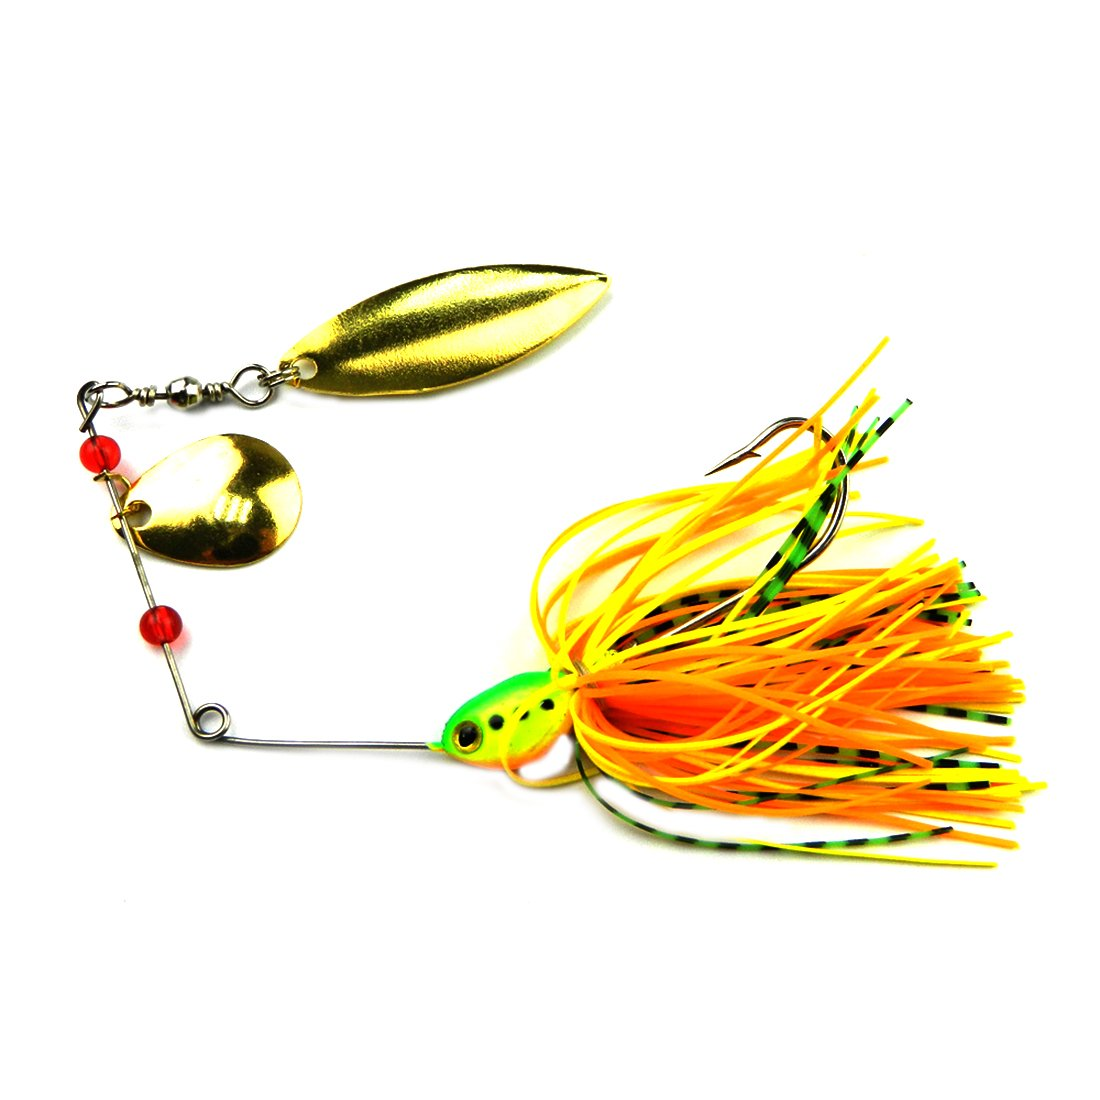 NoyoKere Spinner Bait m/étal leurre dur leurre Spinners Hard Baits couleur al/éatoire